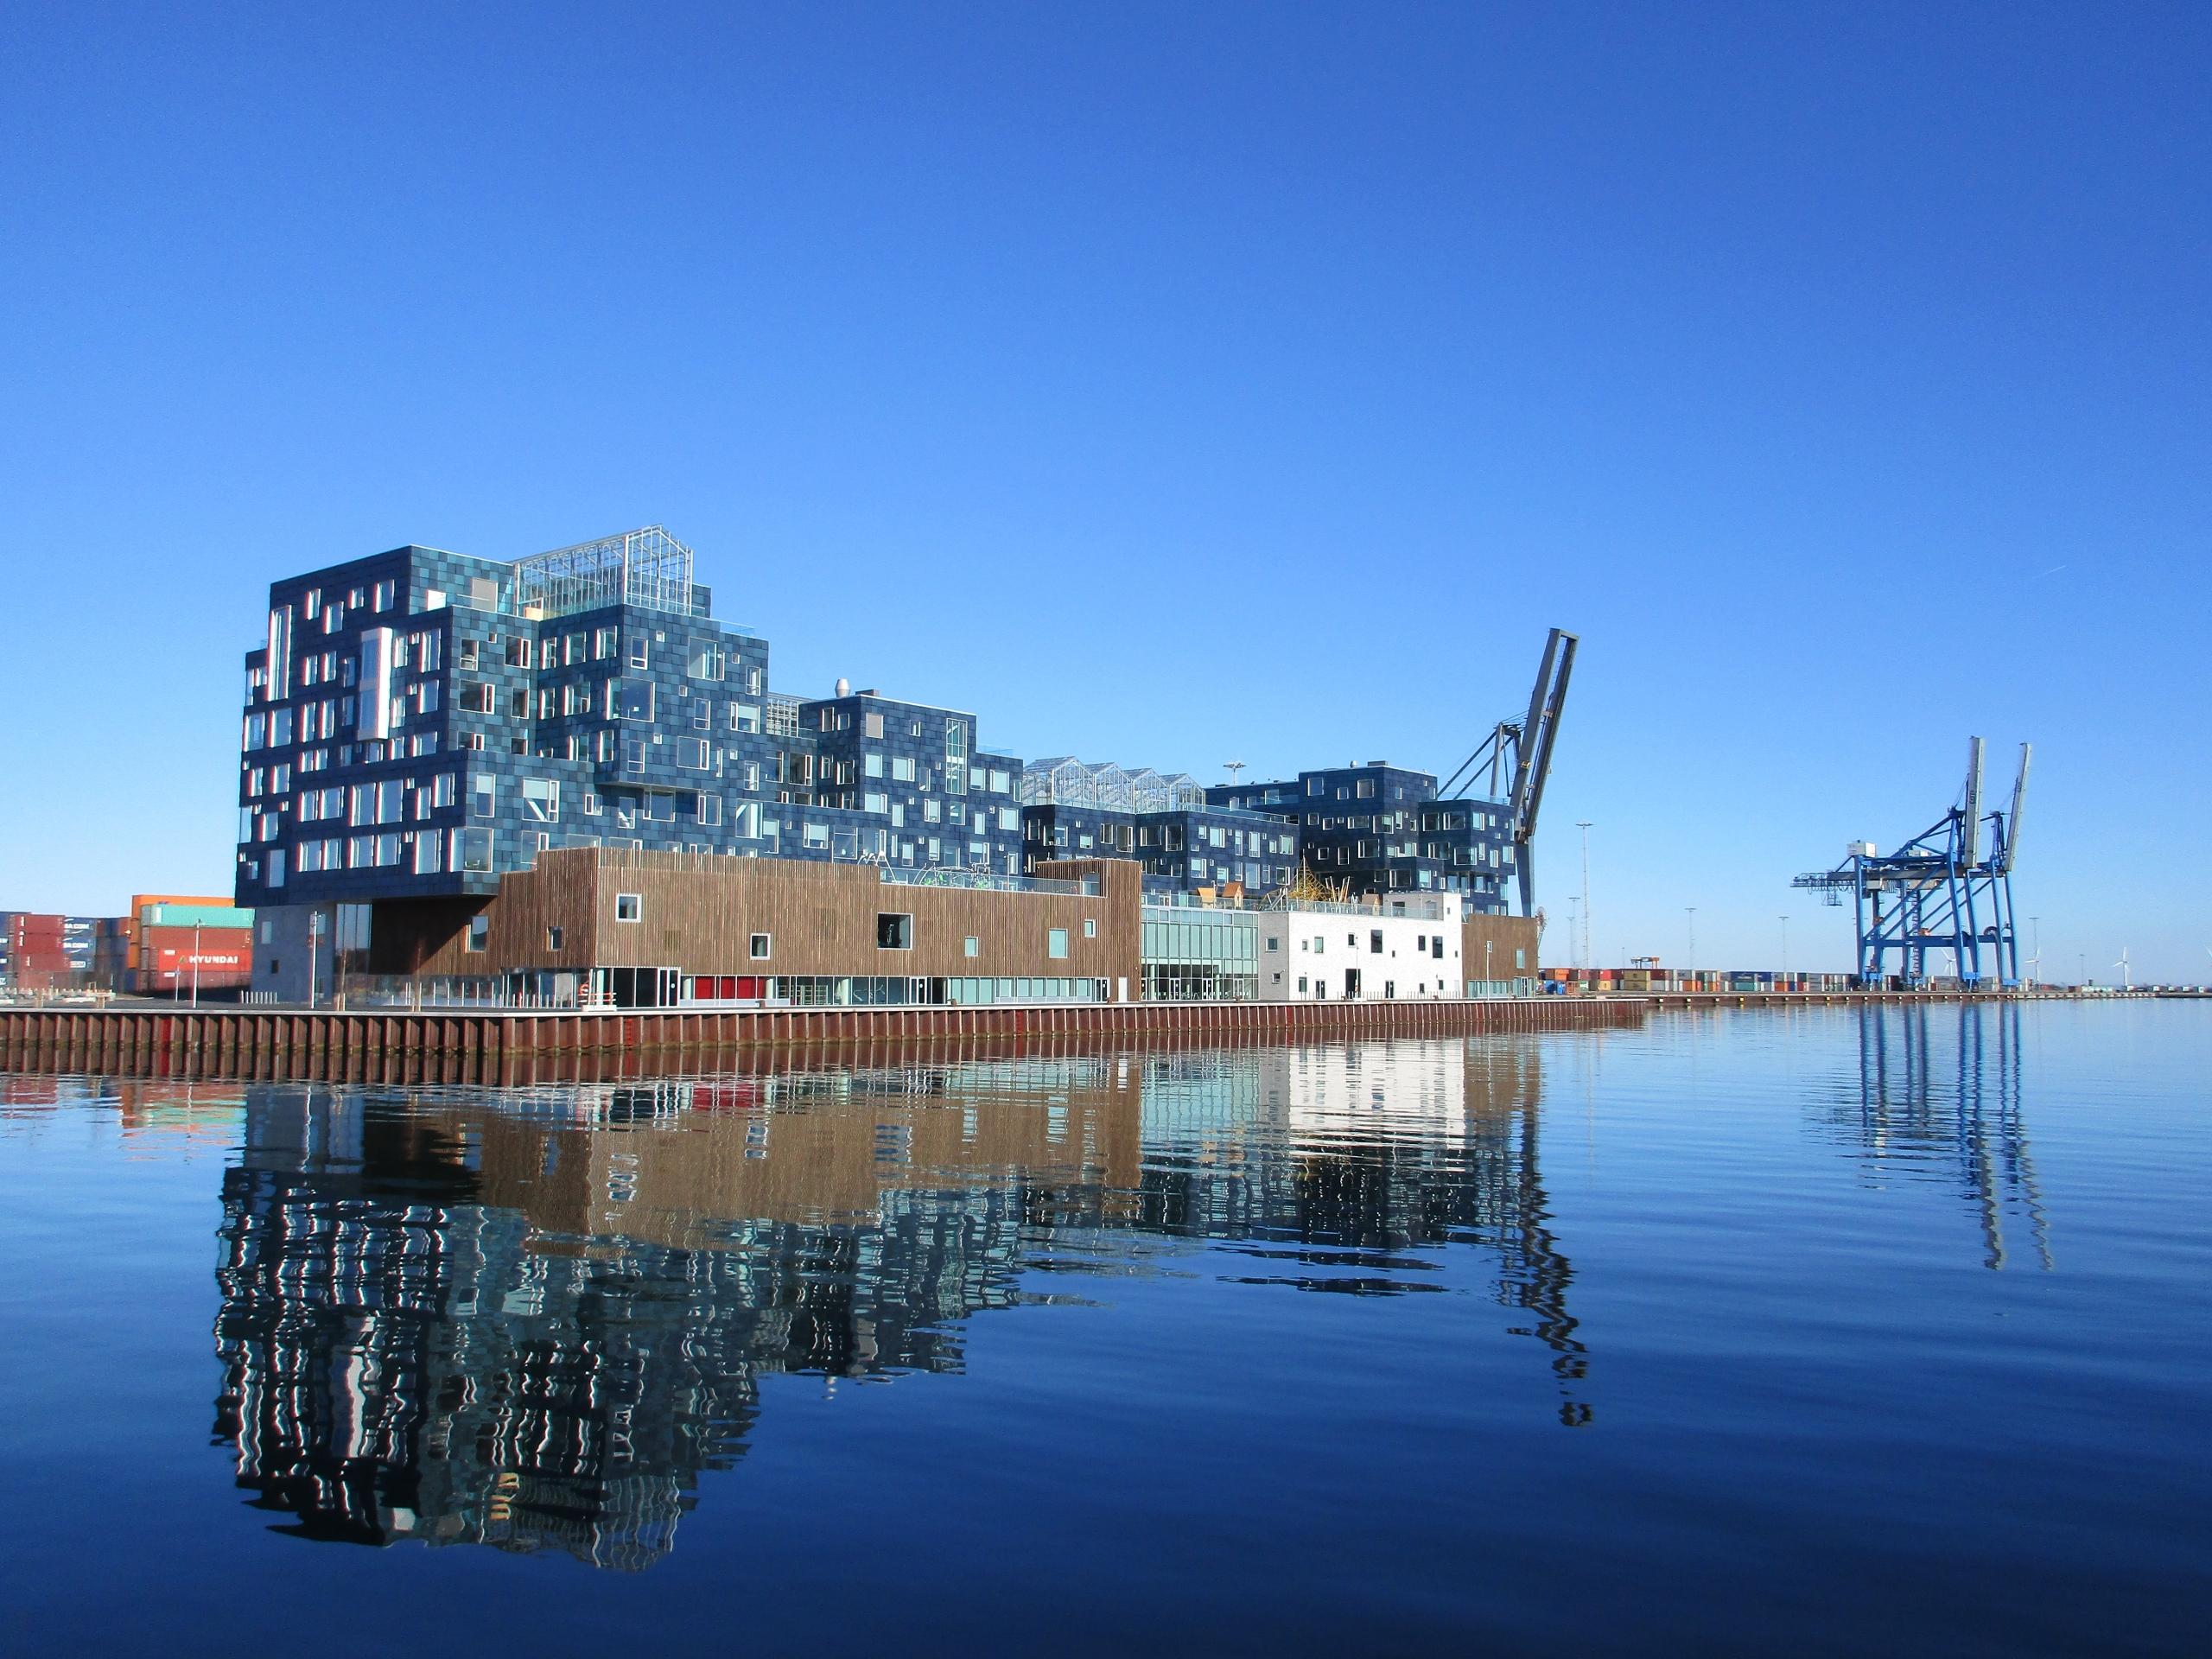 Playing blocks campus Copenhage - northernlad | ello